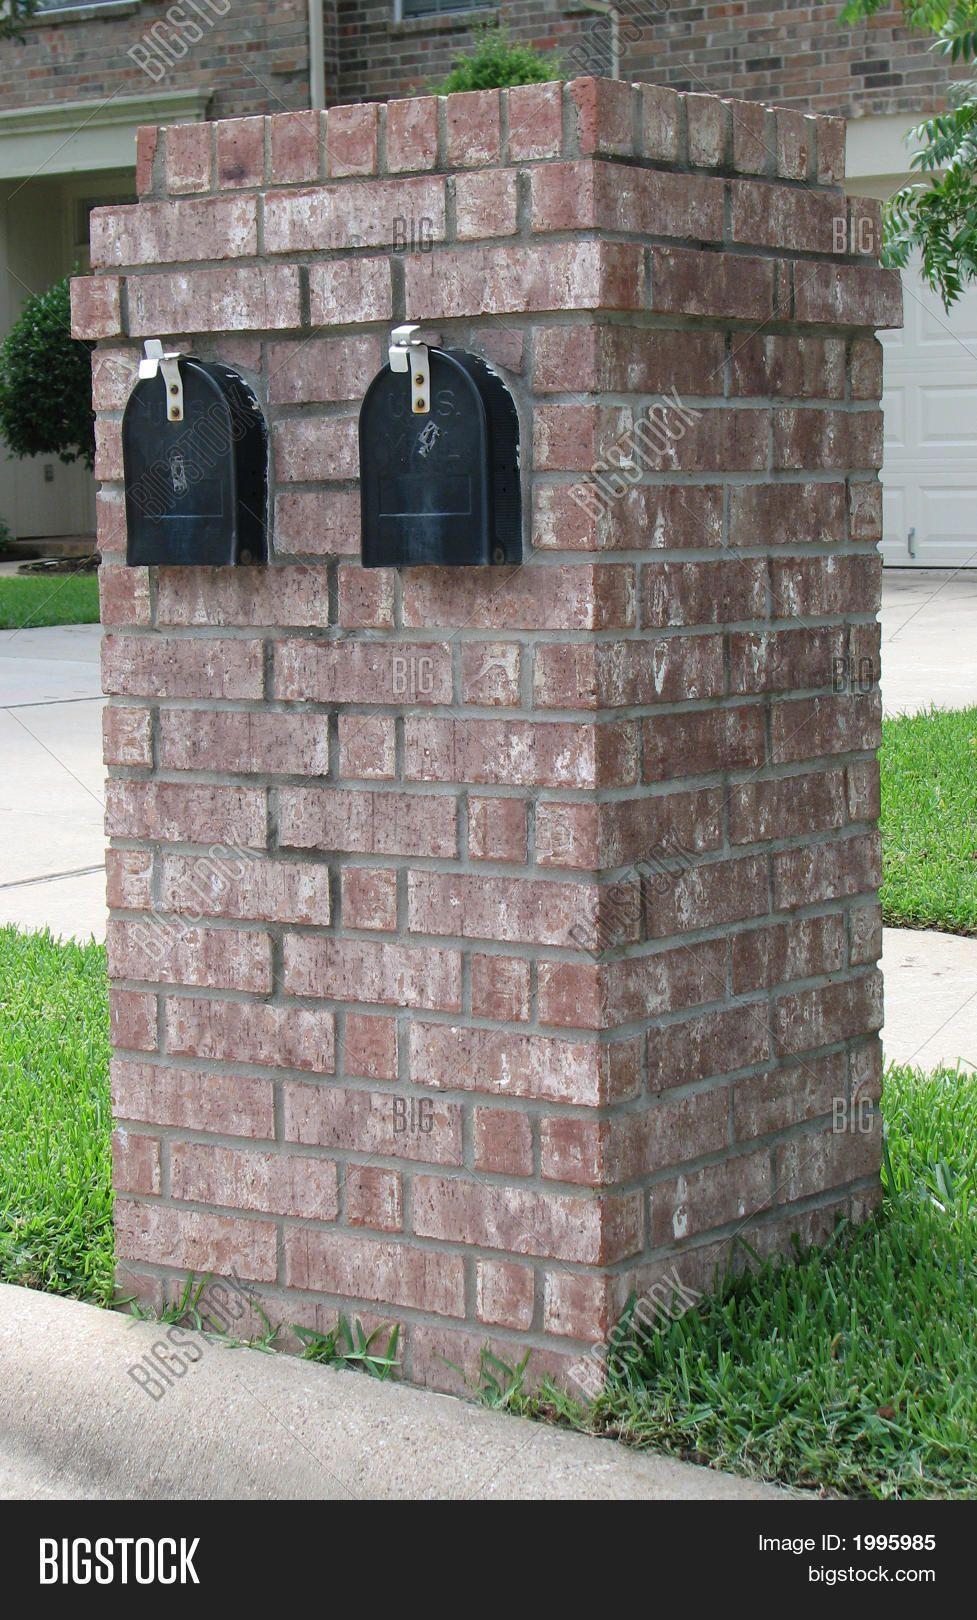 Neighborhood Brick Double Mailbox Brick Mailbox Mailbox